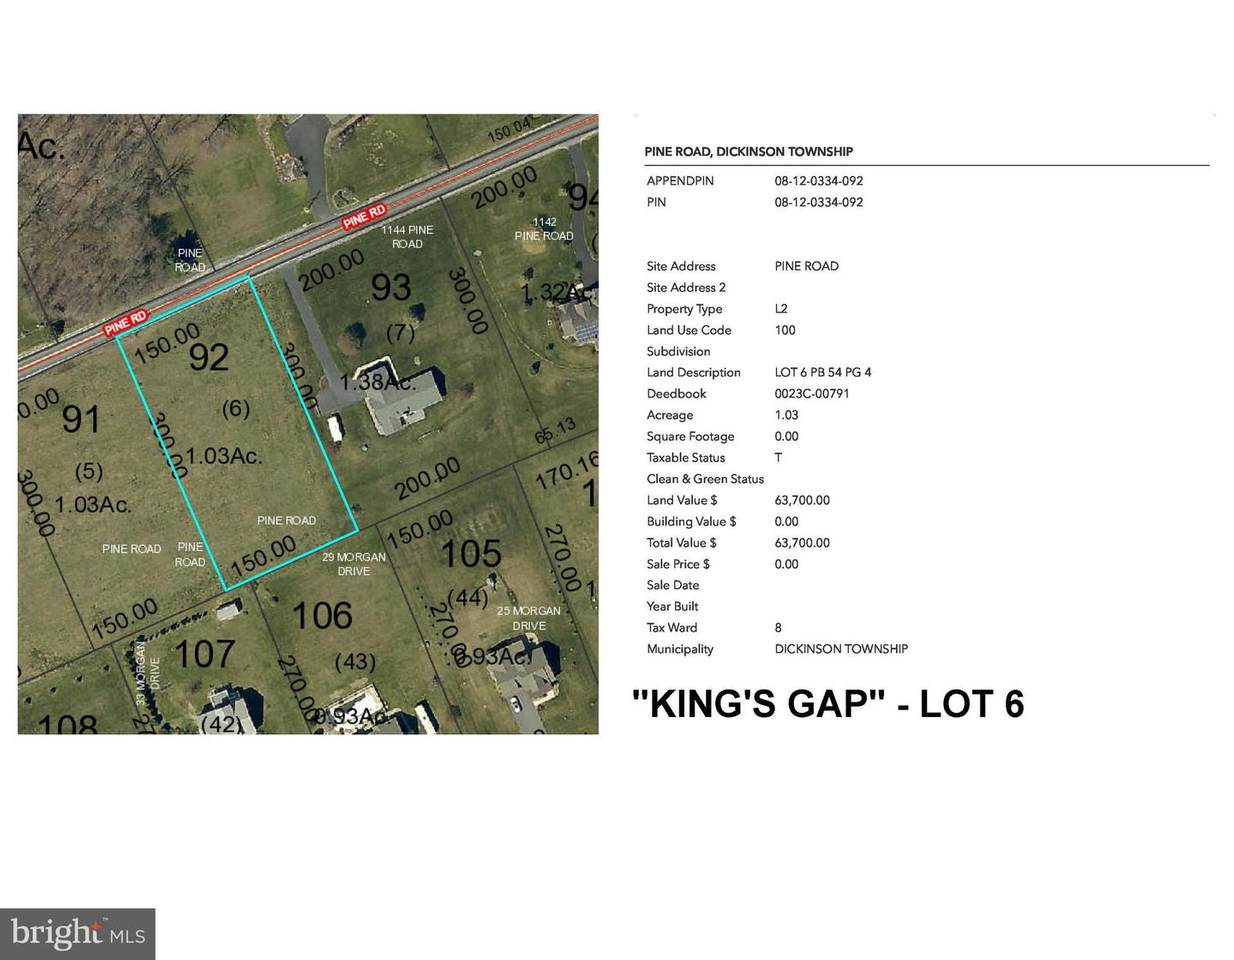 Kings Gap - Pine Road - Photo 1